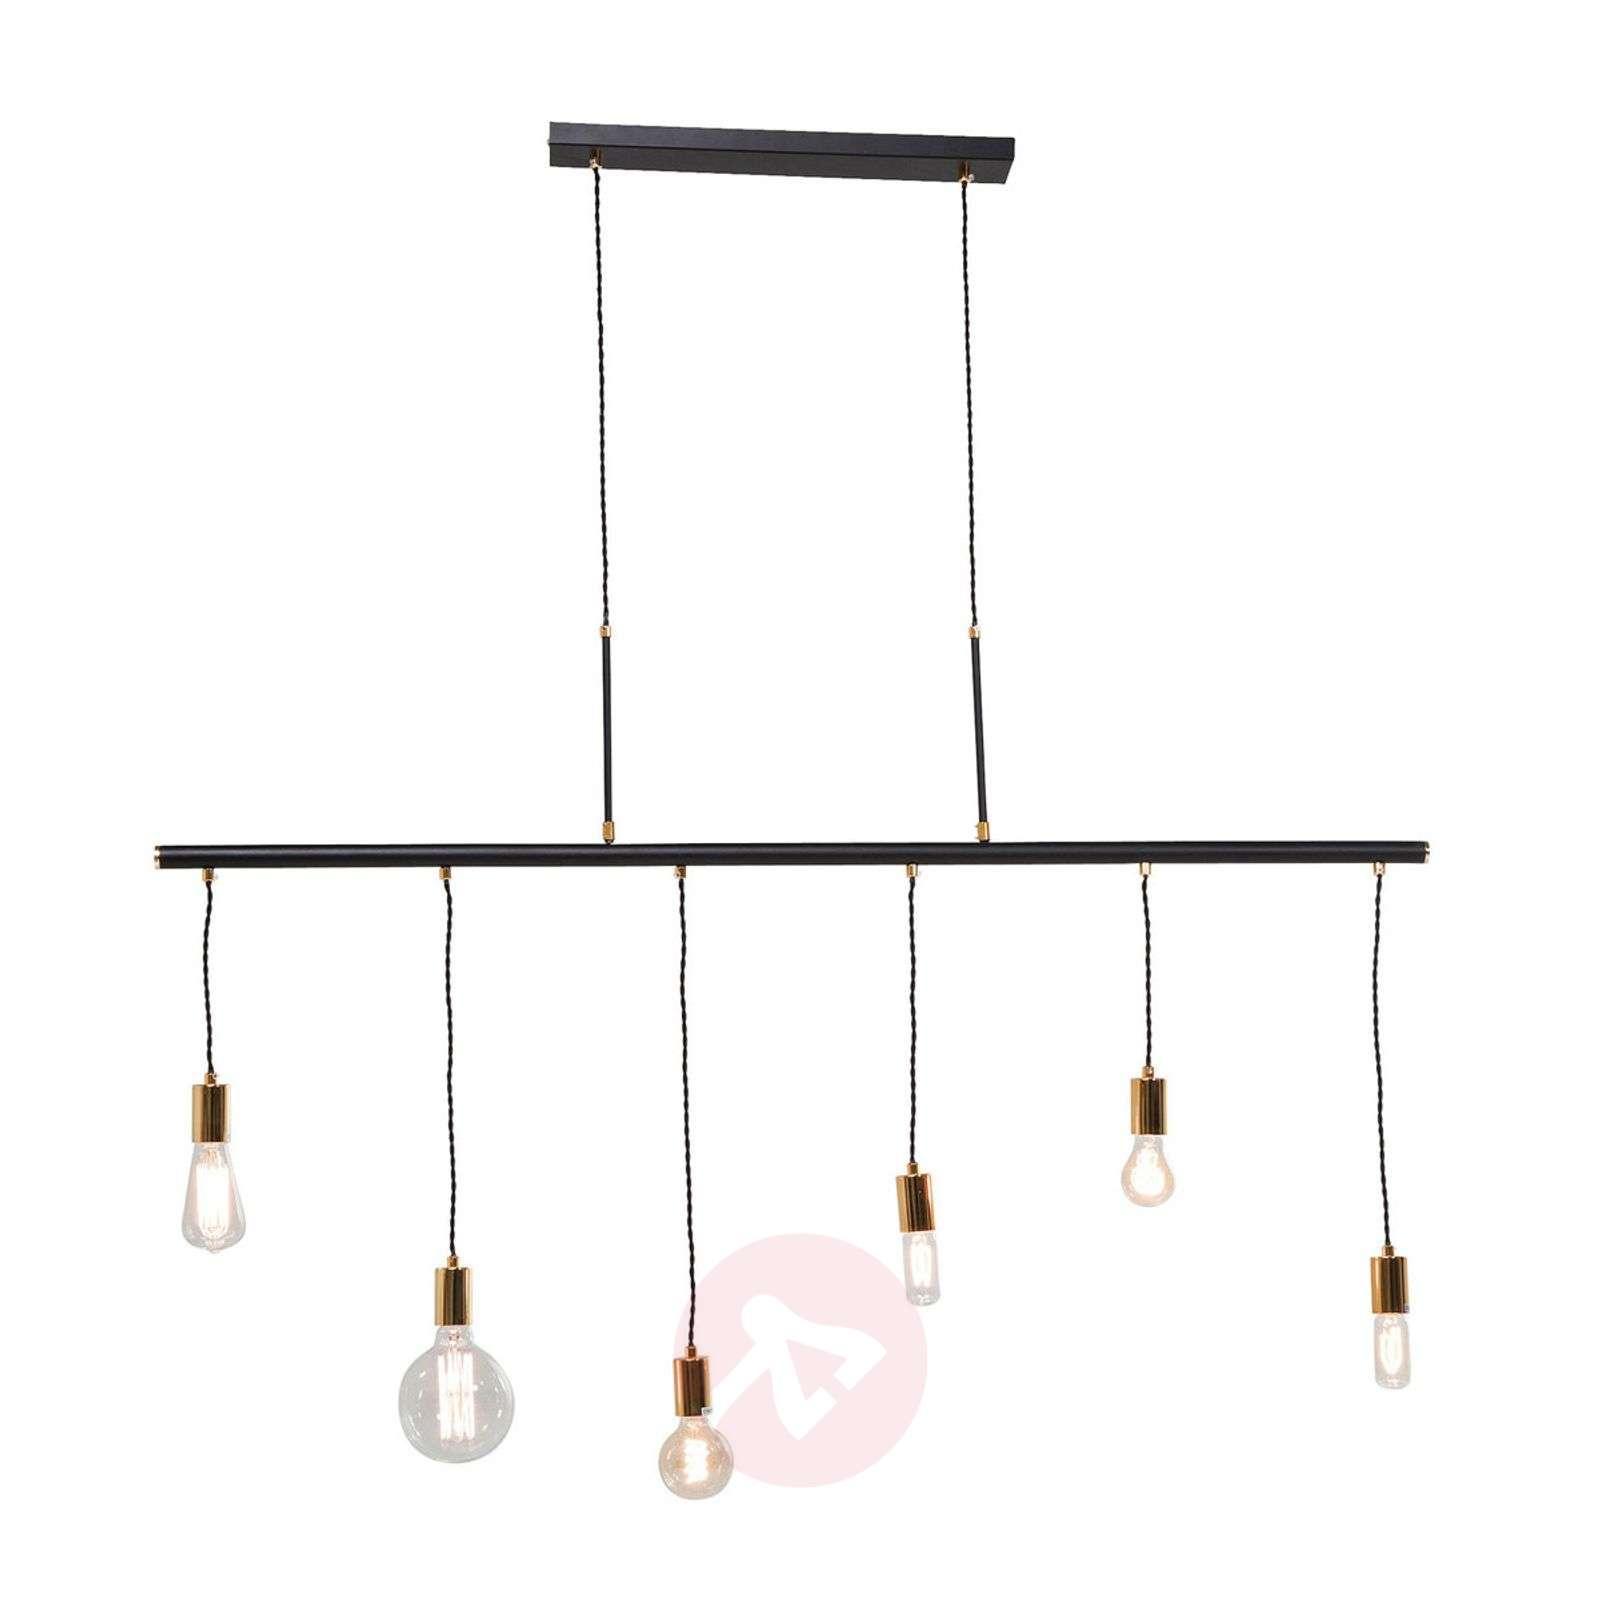 KARE Pole Six black hanging light-5517408-01